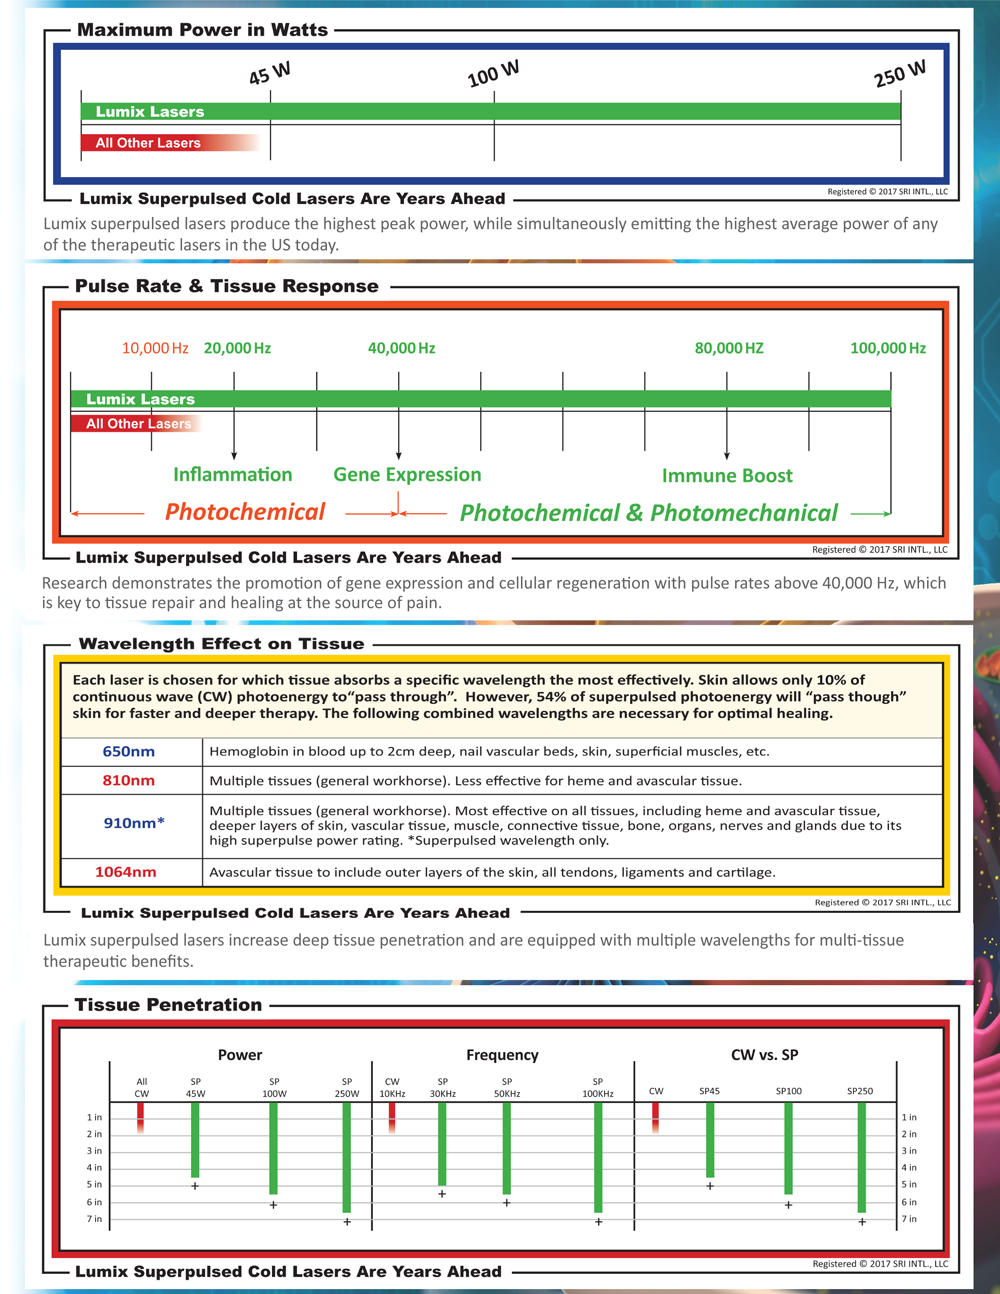 SRAPL-Laser-Facts-1.png